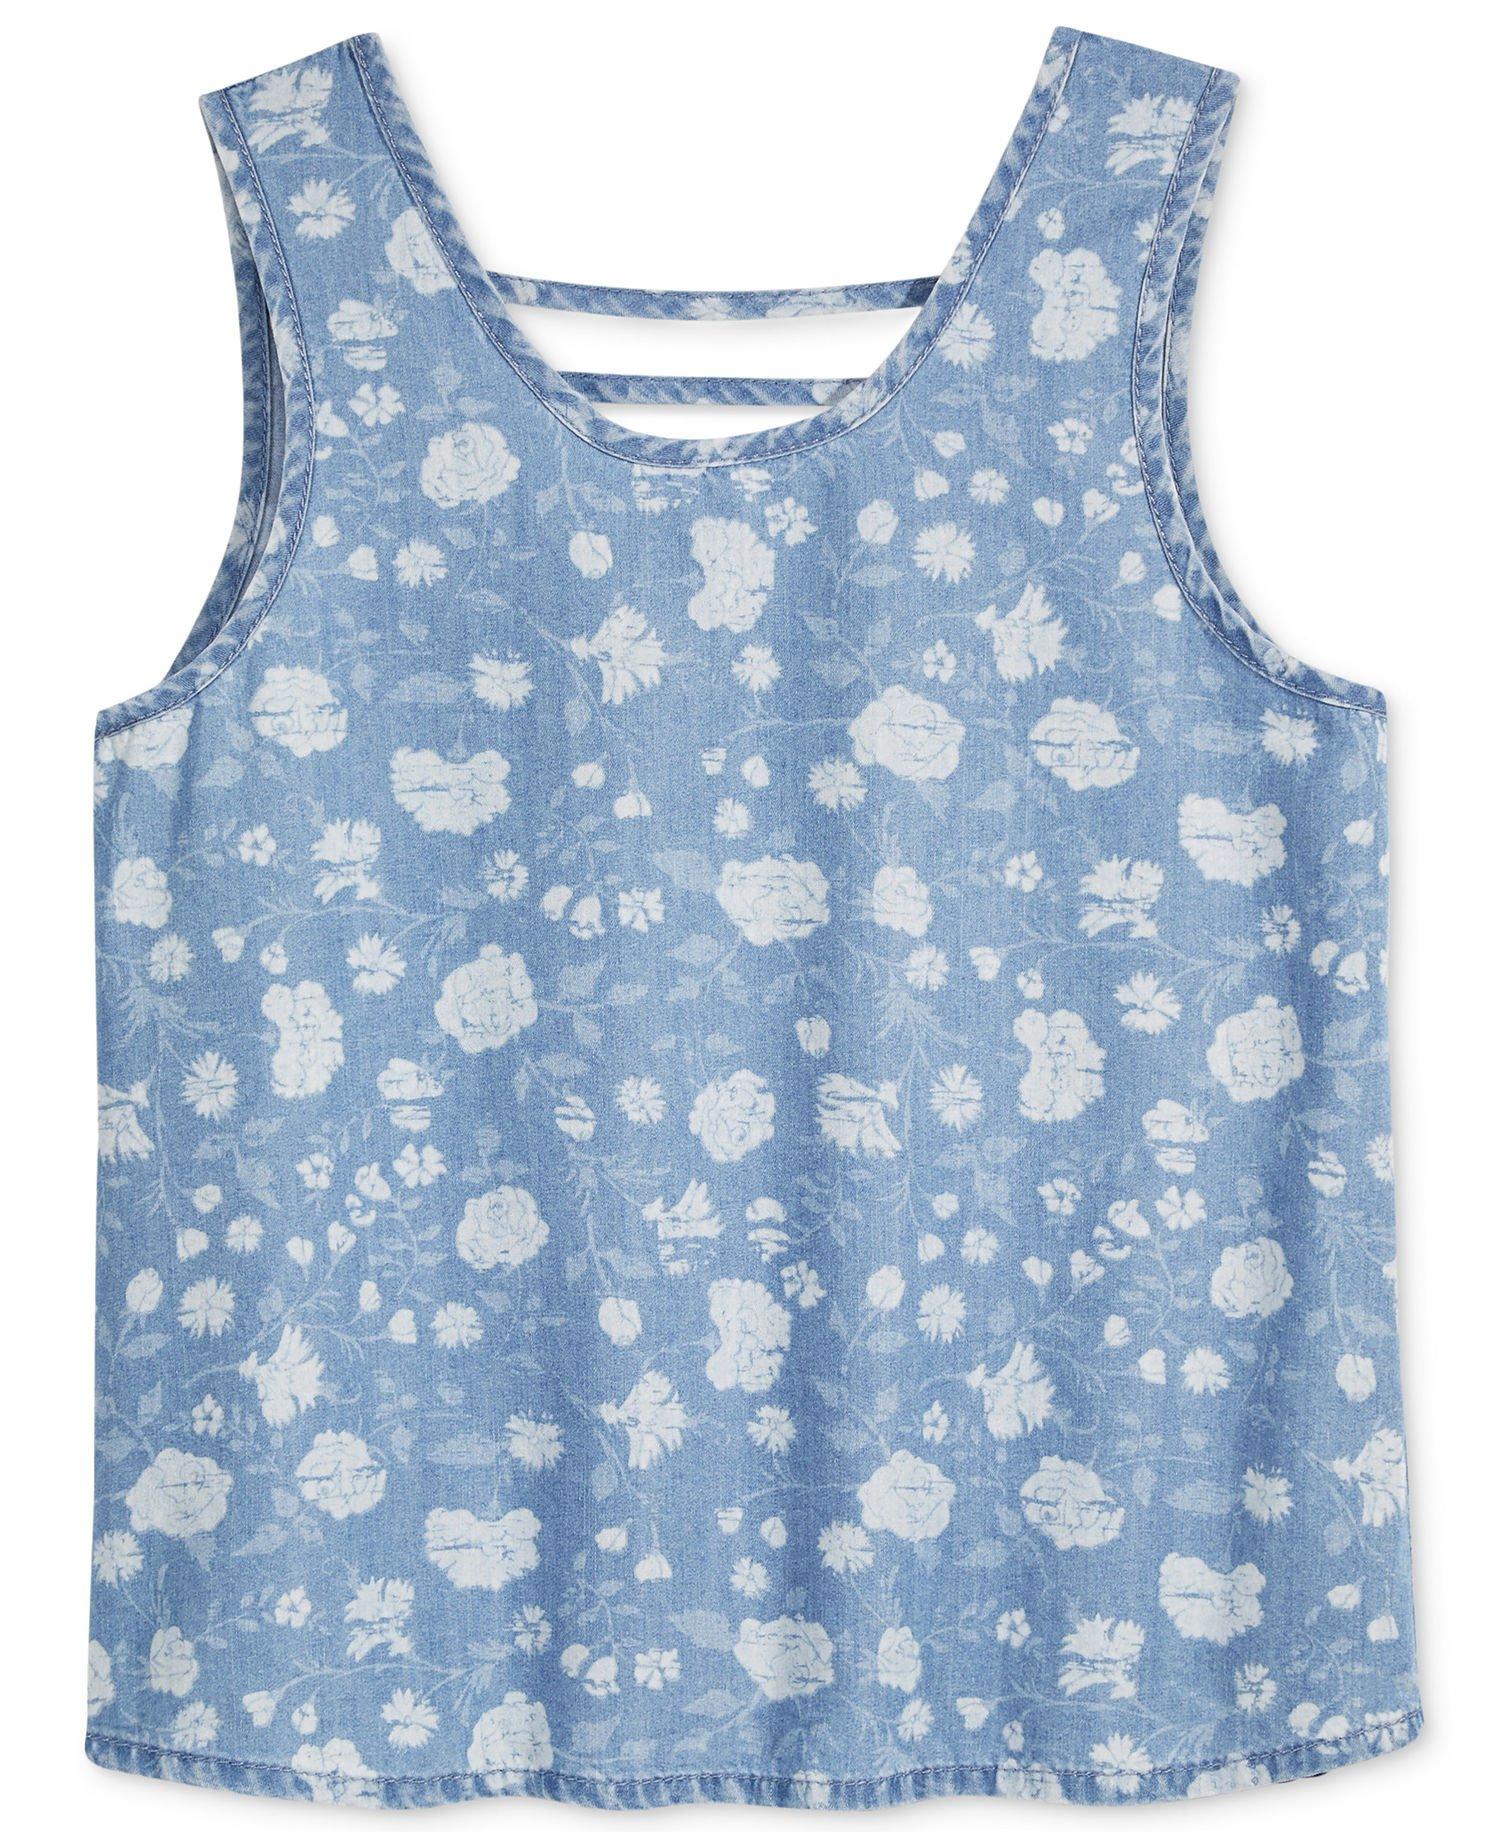 Tinsey Girls Tank Top (Small, Light Blue)